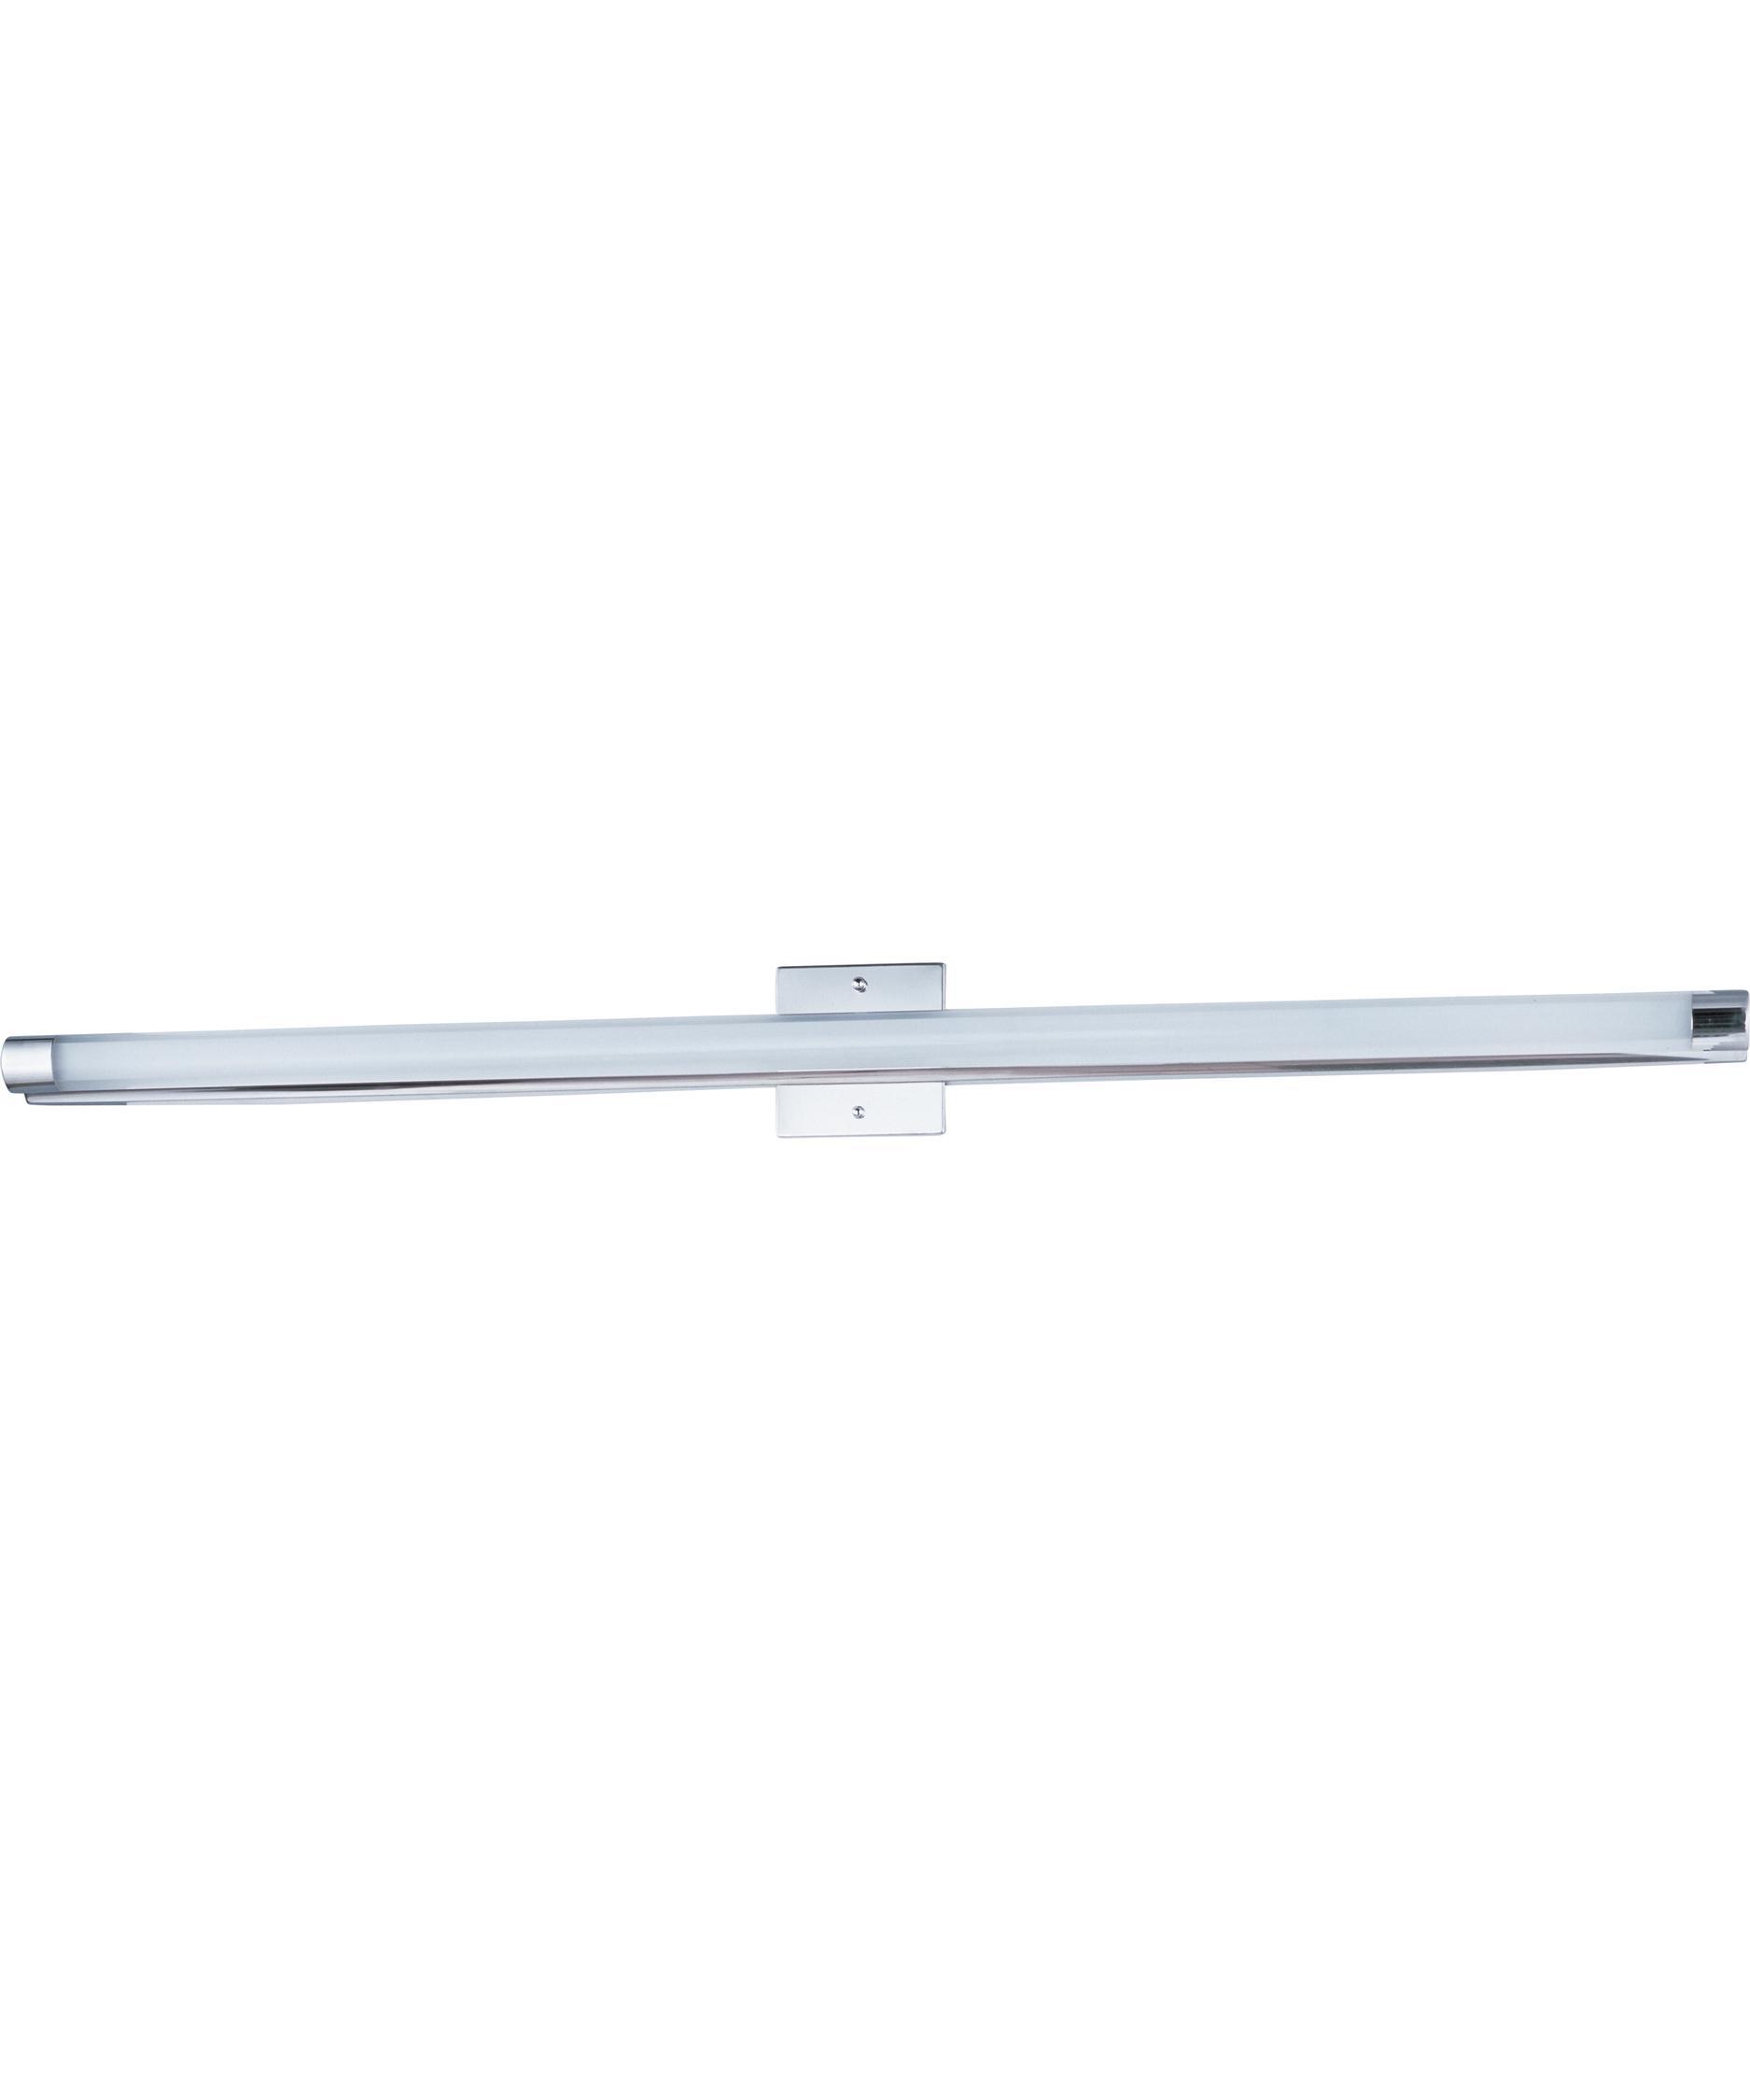 ET2 Lighting Wand LED 48 Inch Wide Bath Vanity Light | Capitol Lighting  1 800lighting